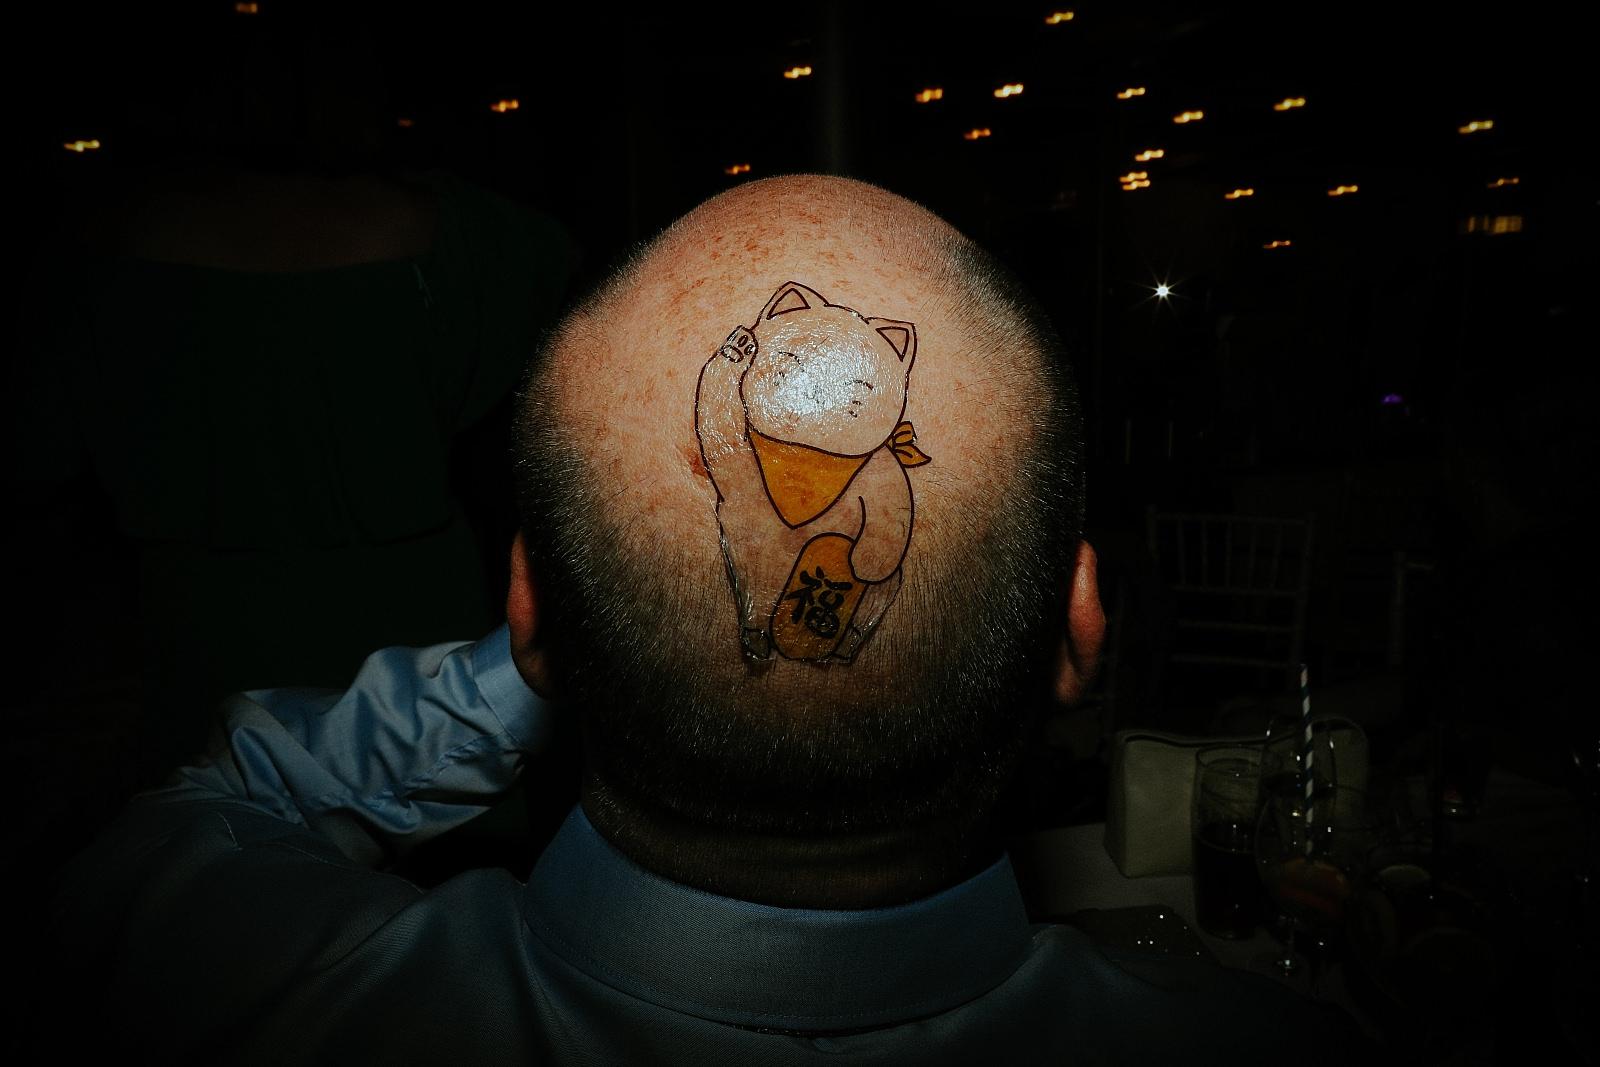 tattoo on bald head